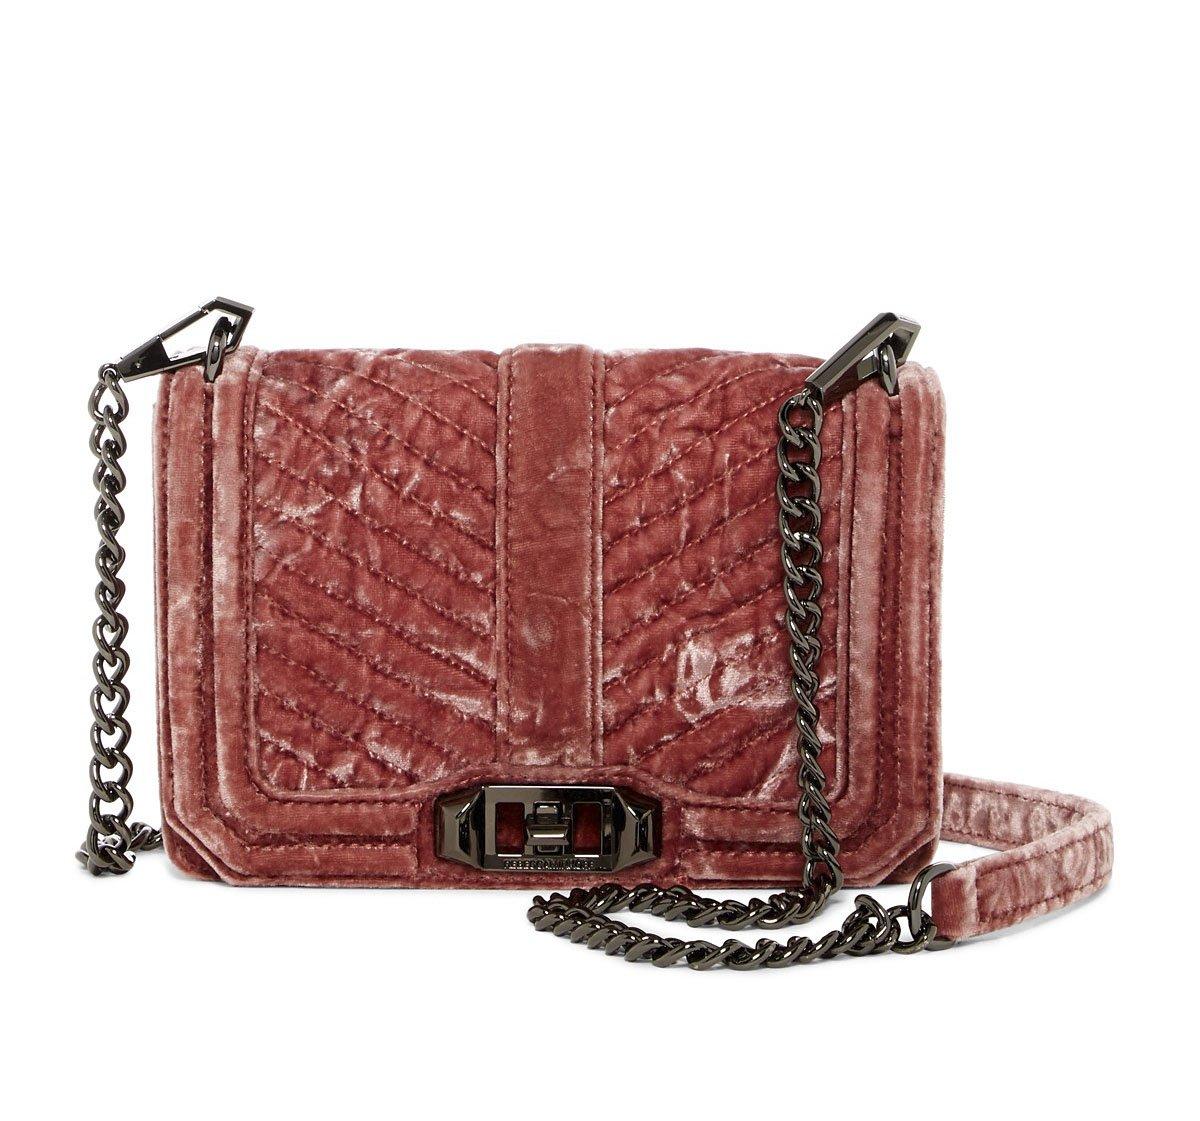 Rebecca Minkoff Soft Pink Velvet Small Love Crossbody Bag